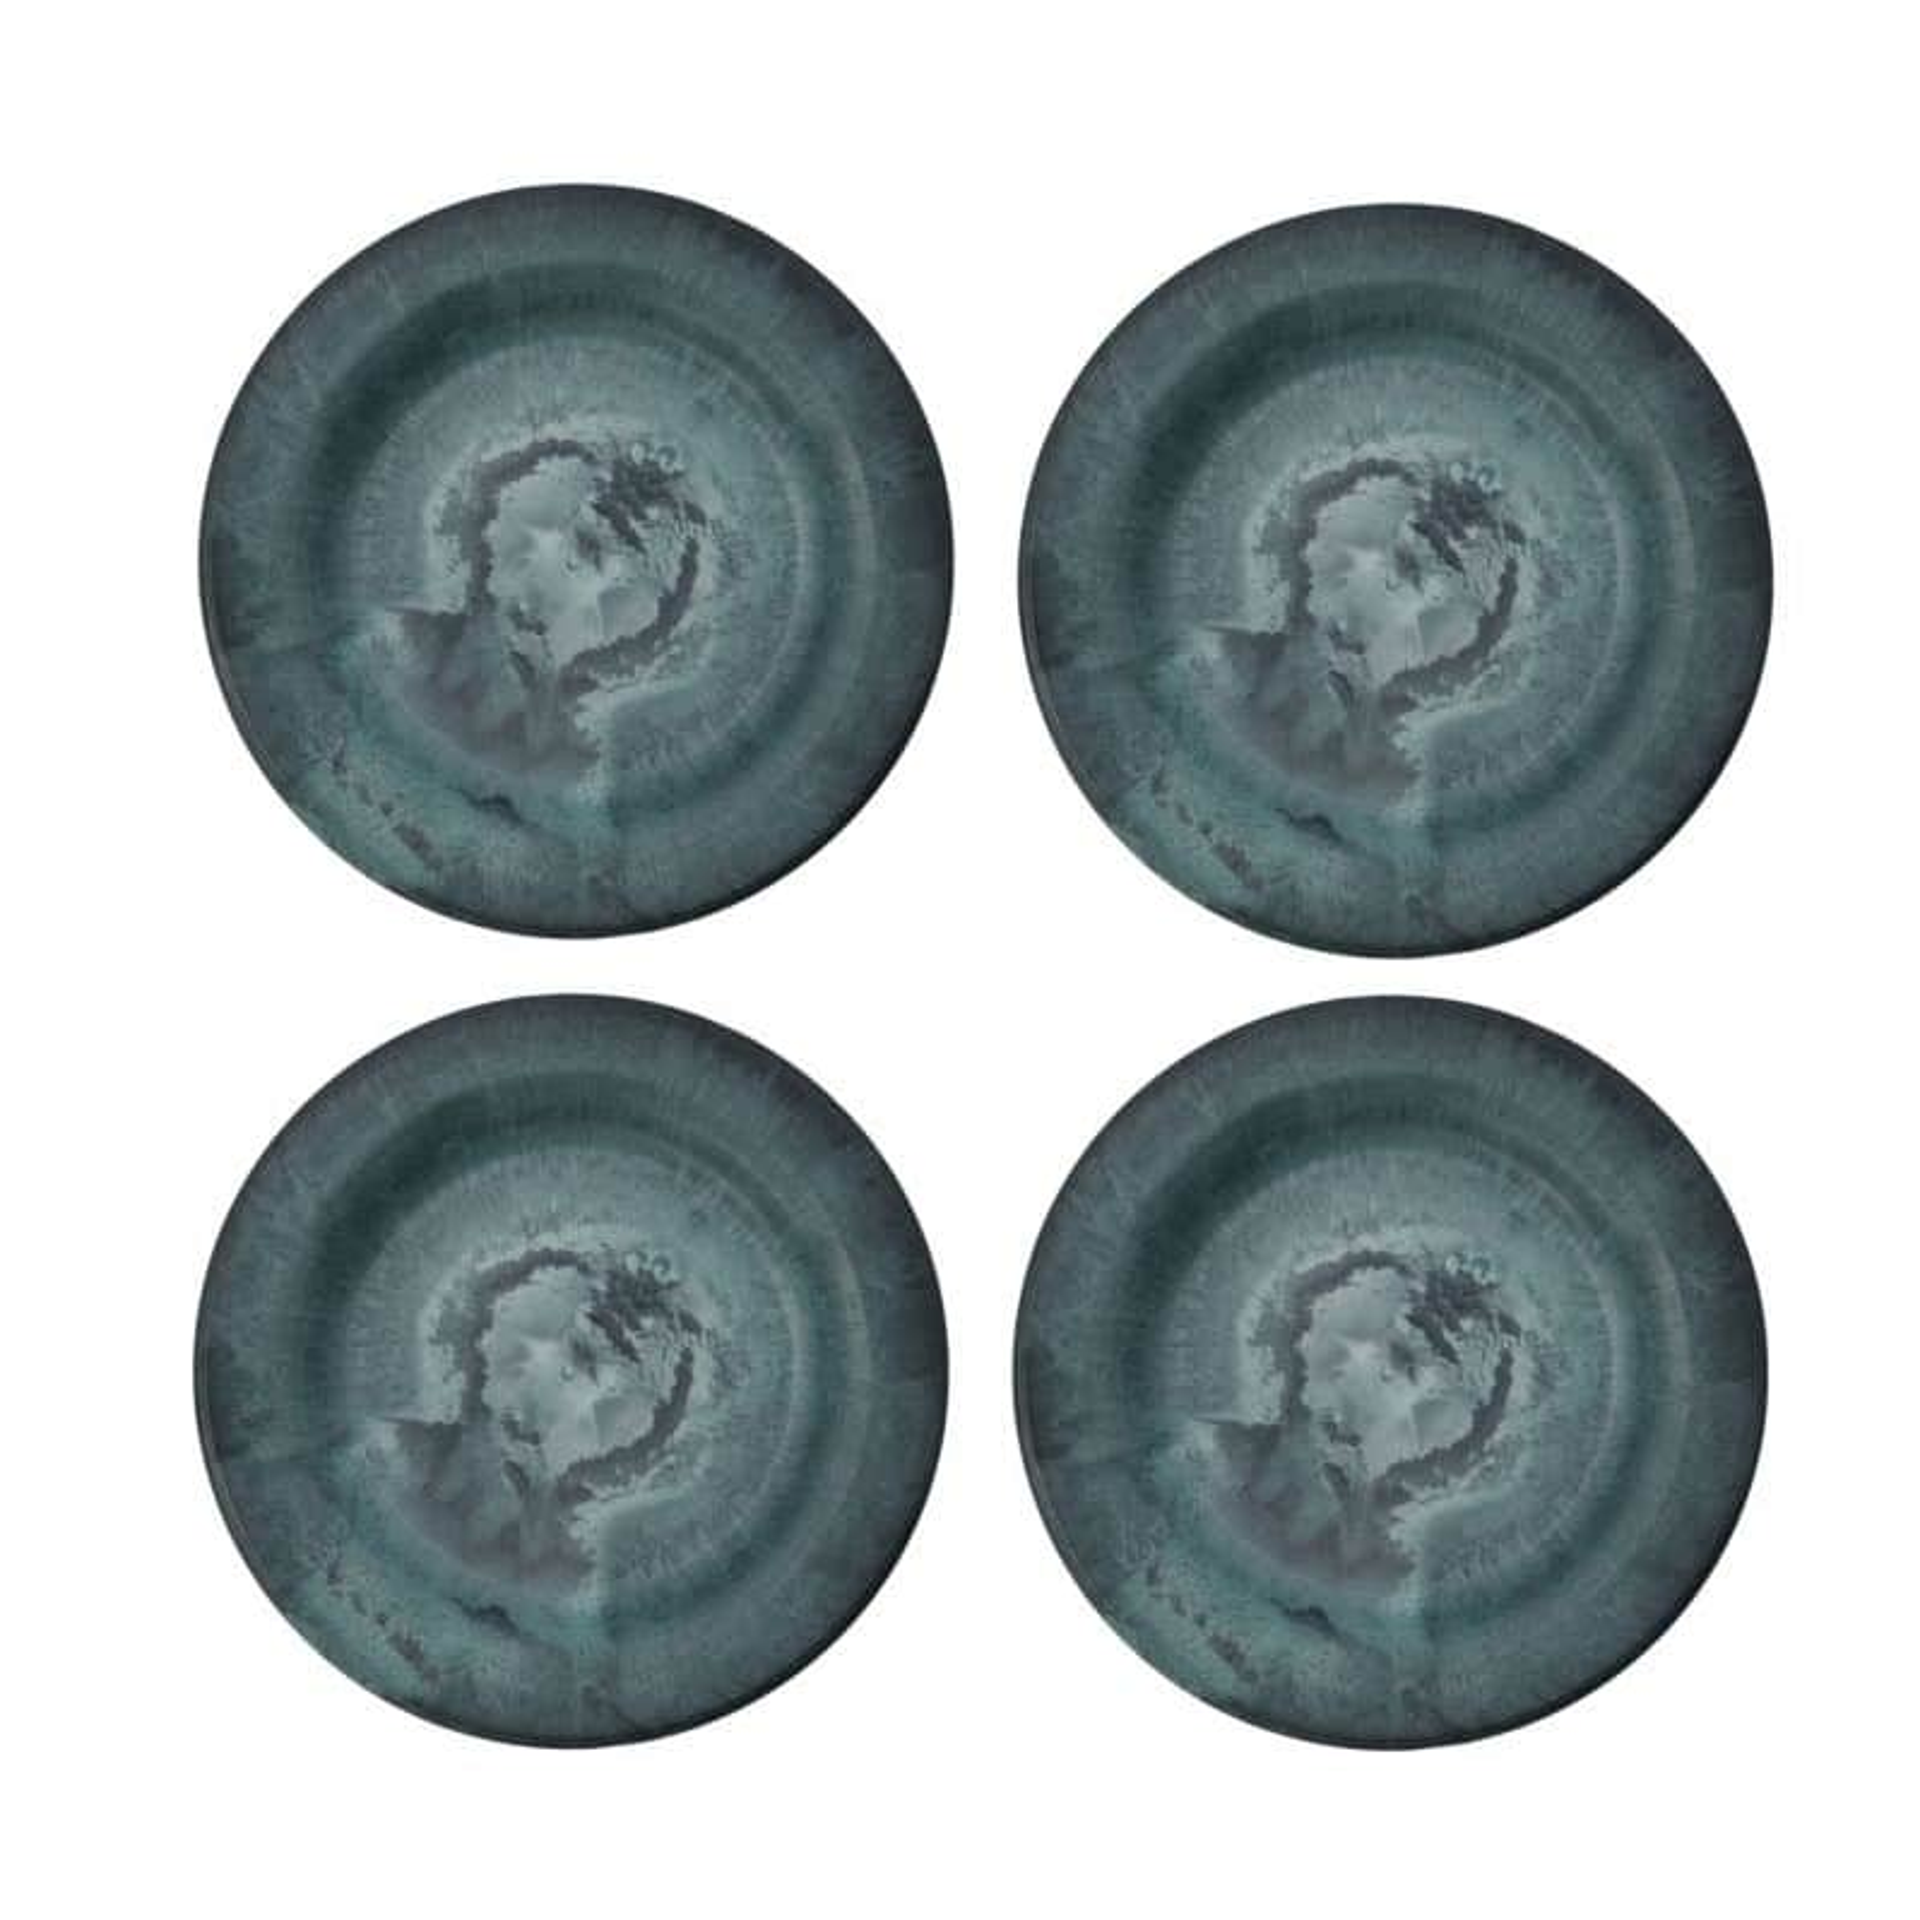 House Doctor Sada talířů Artstone Smaragd - 4 ks, modrá barva, zelená barva, plast